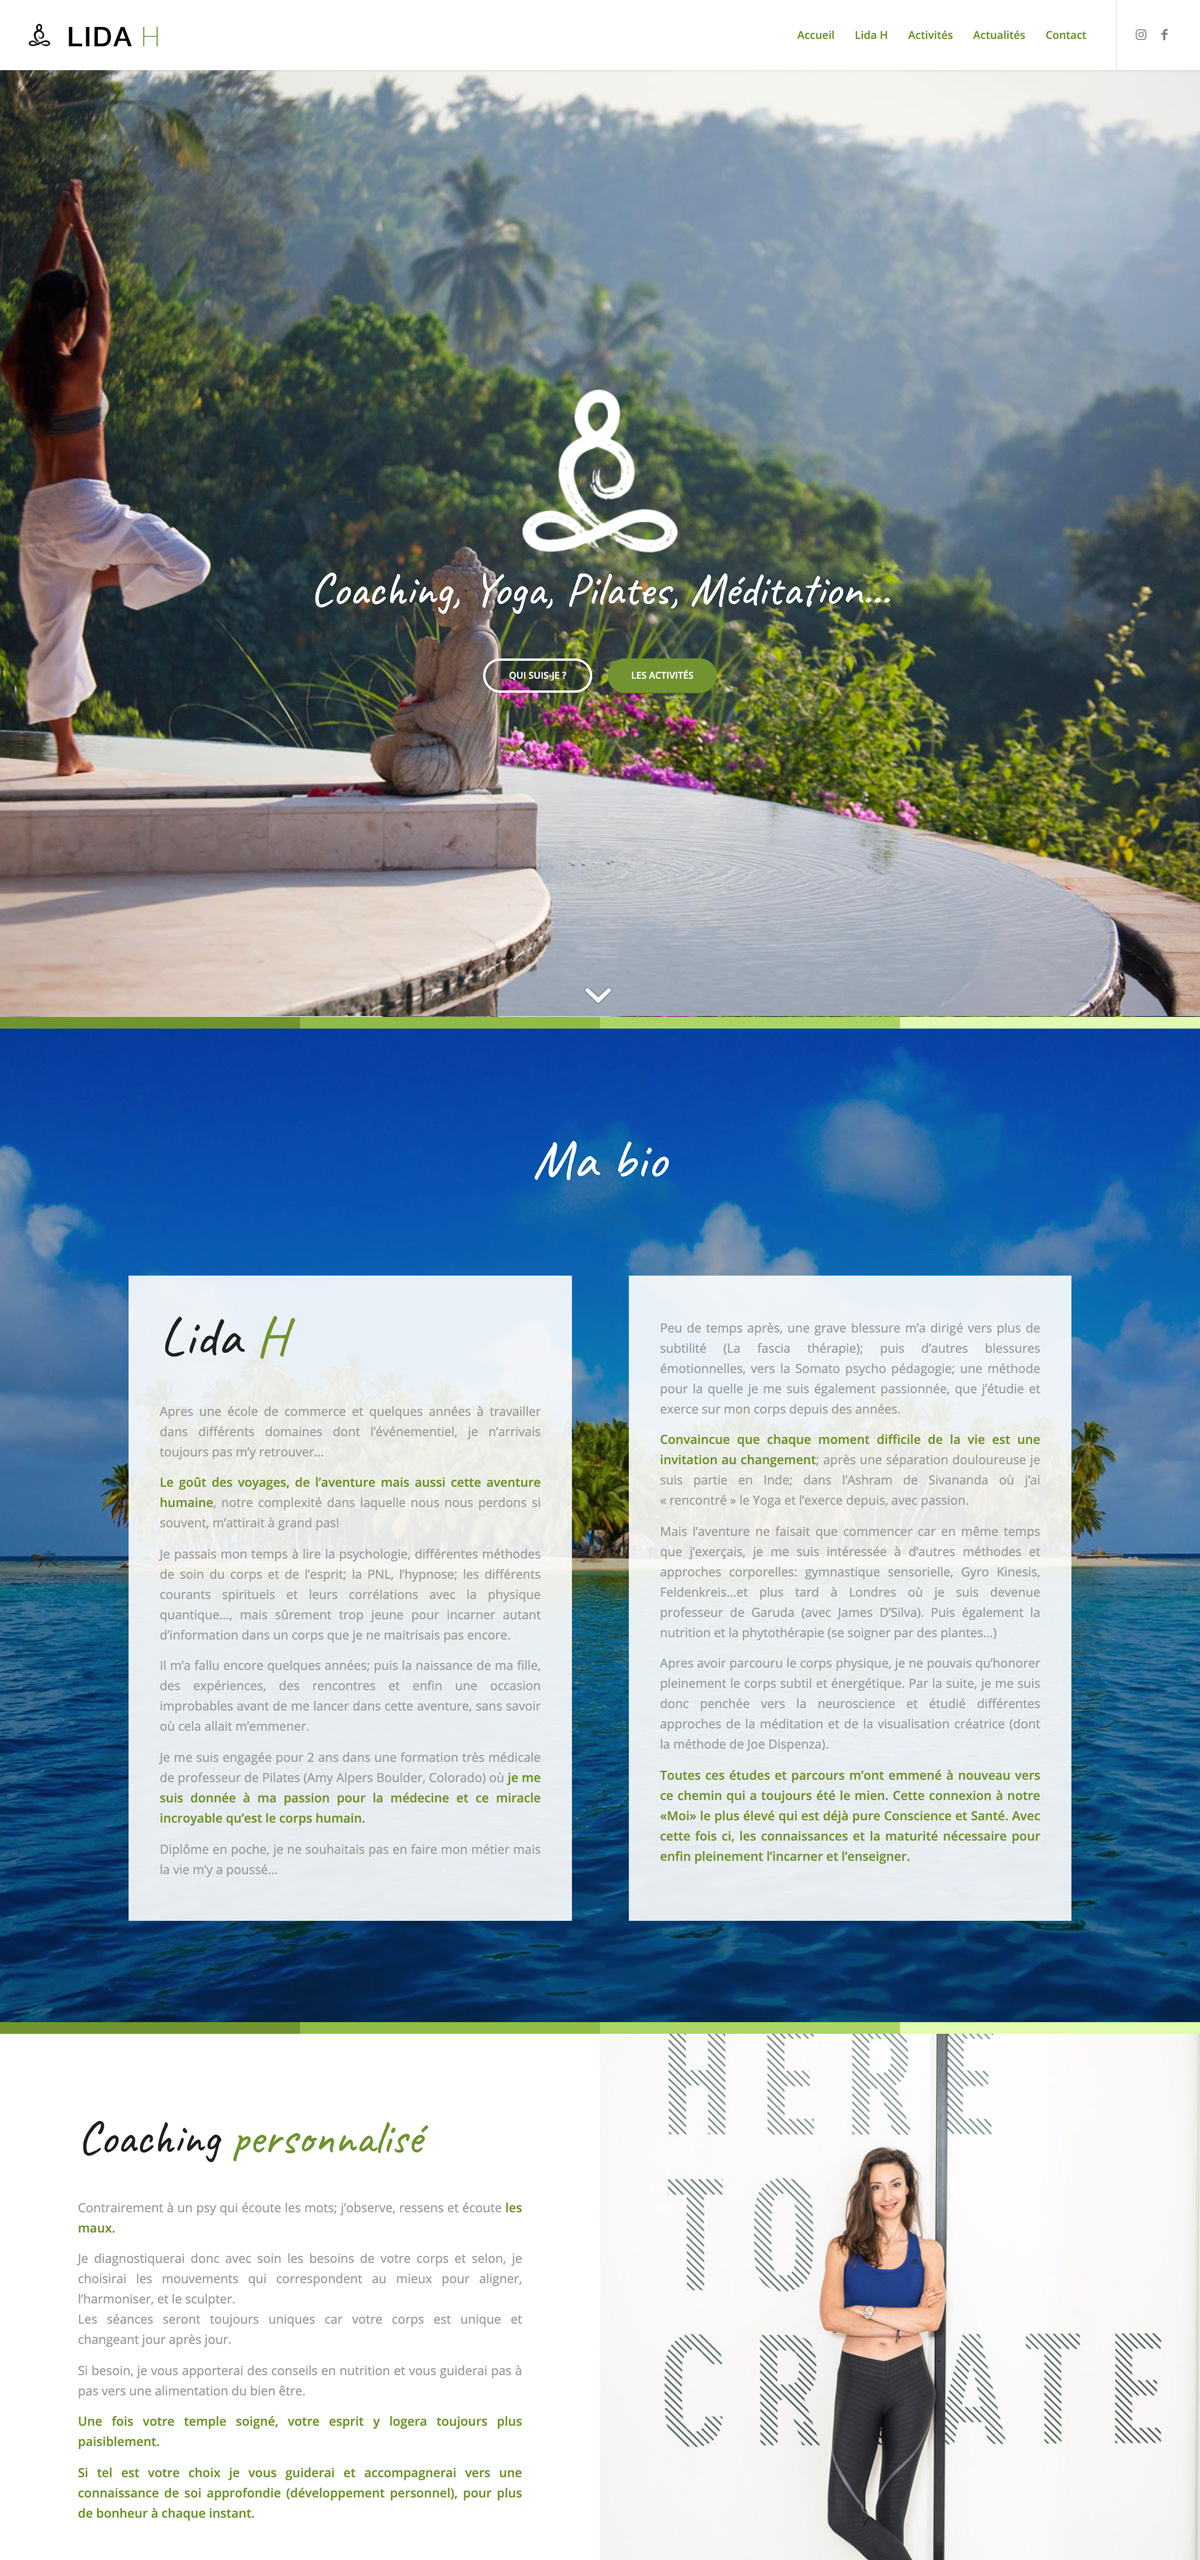 rdsc yoga lida h website screenshot